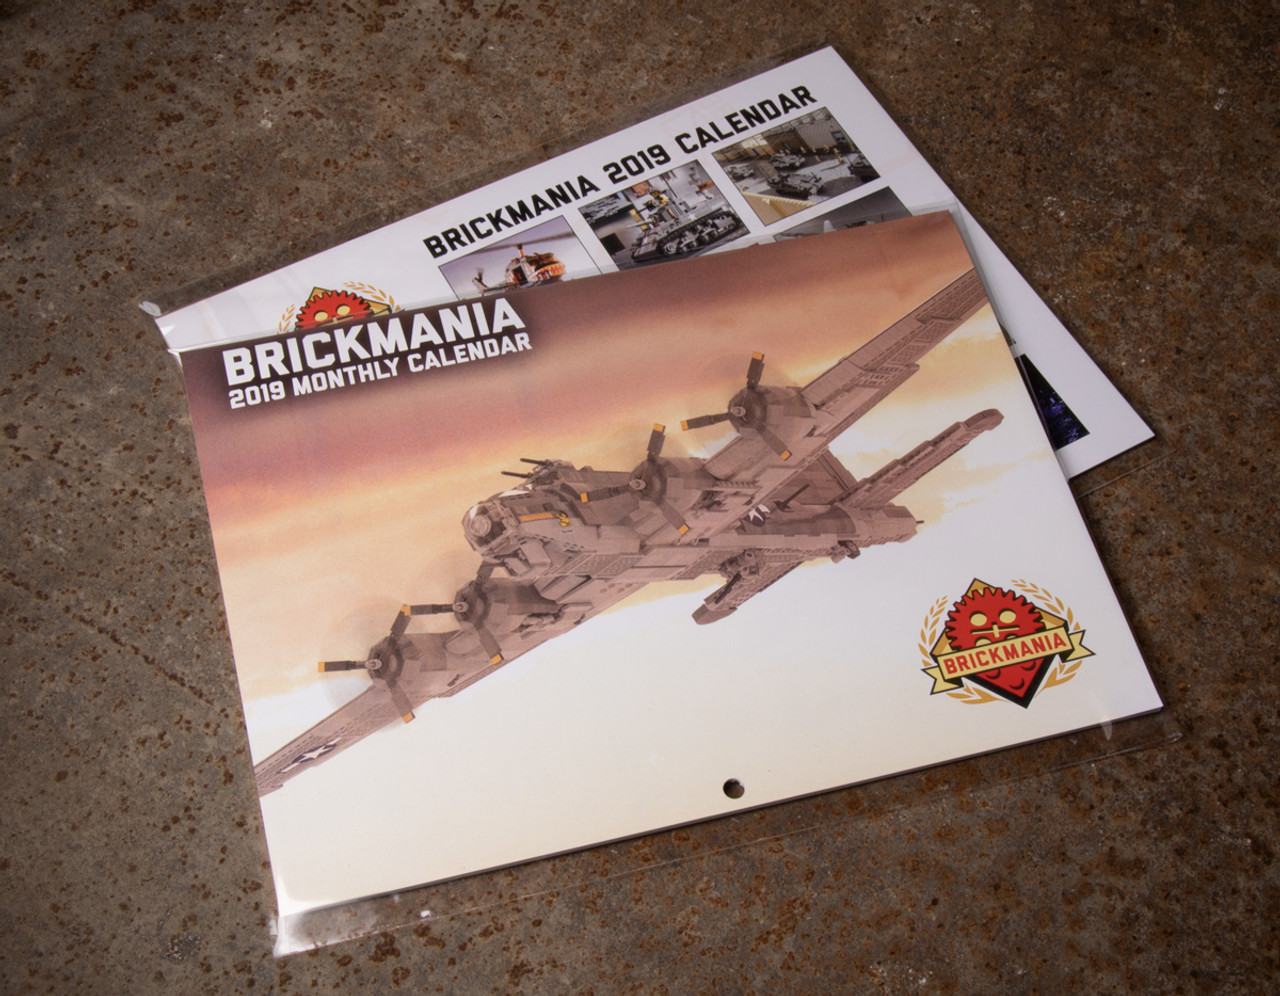 Brickmania 2019 Calendar